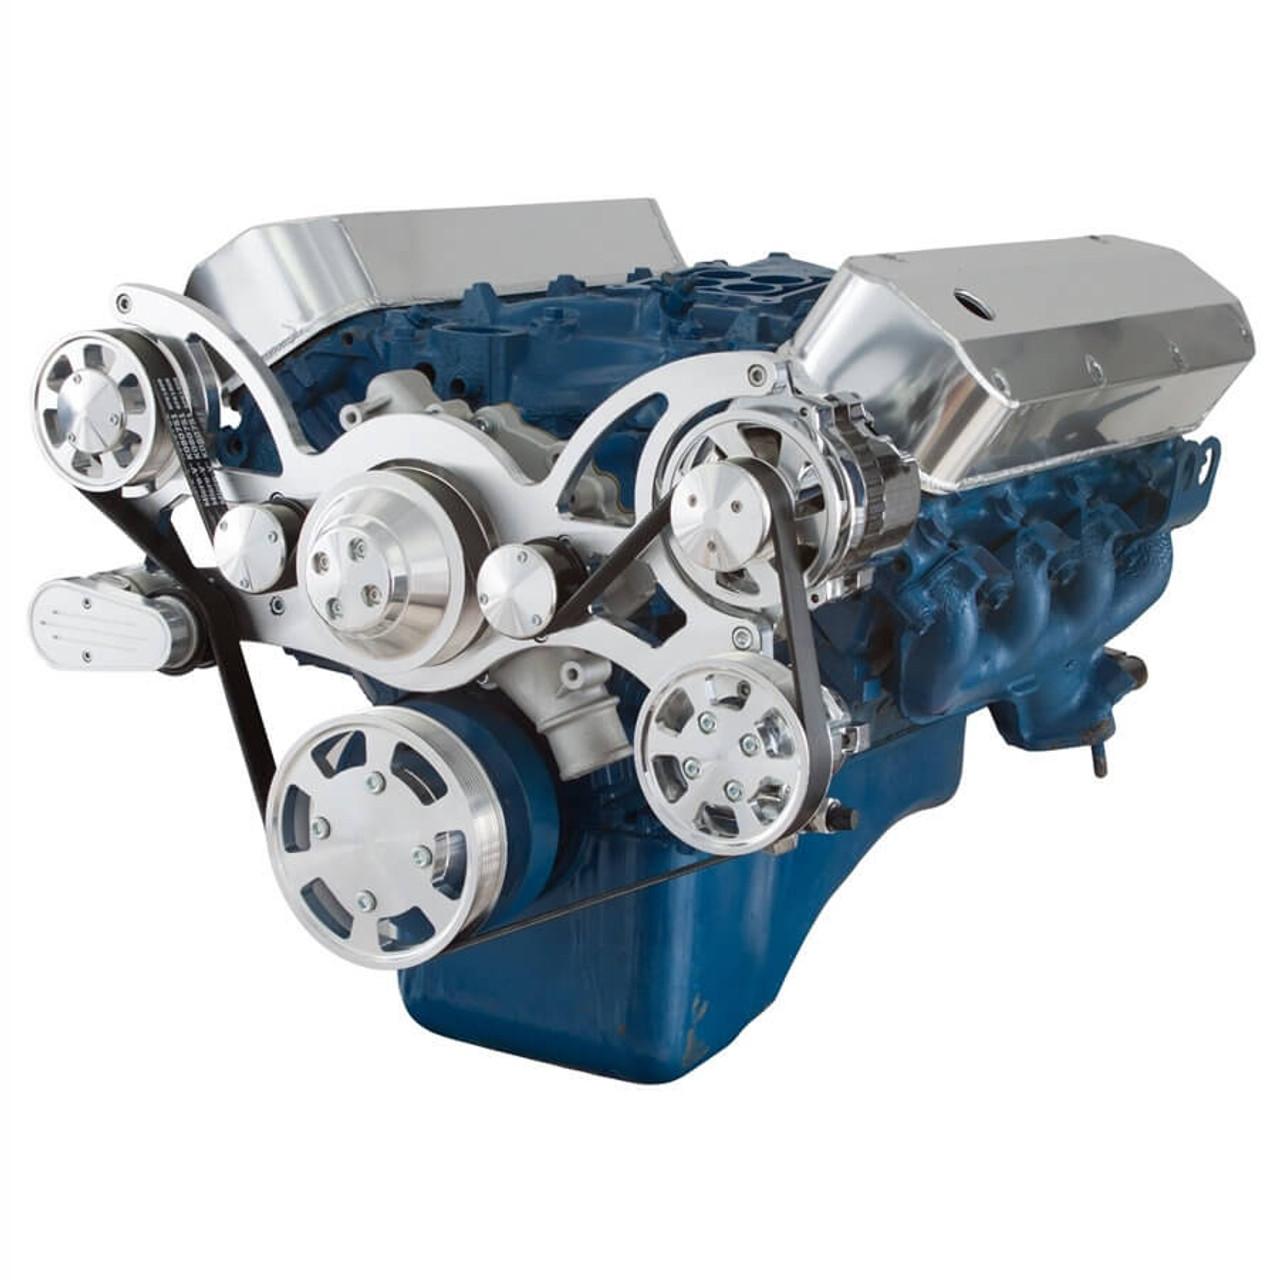 Serpentine System for 429 & 460 - Power Steering & Alternator ...